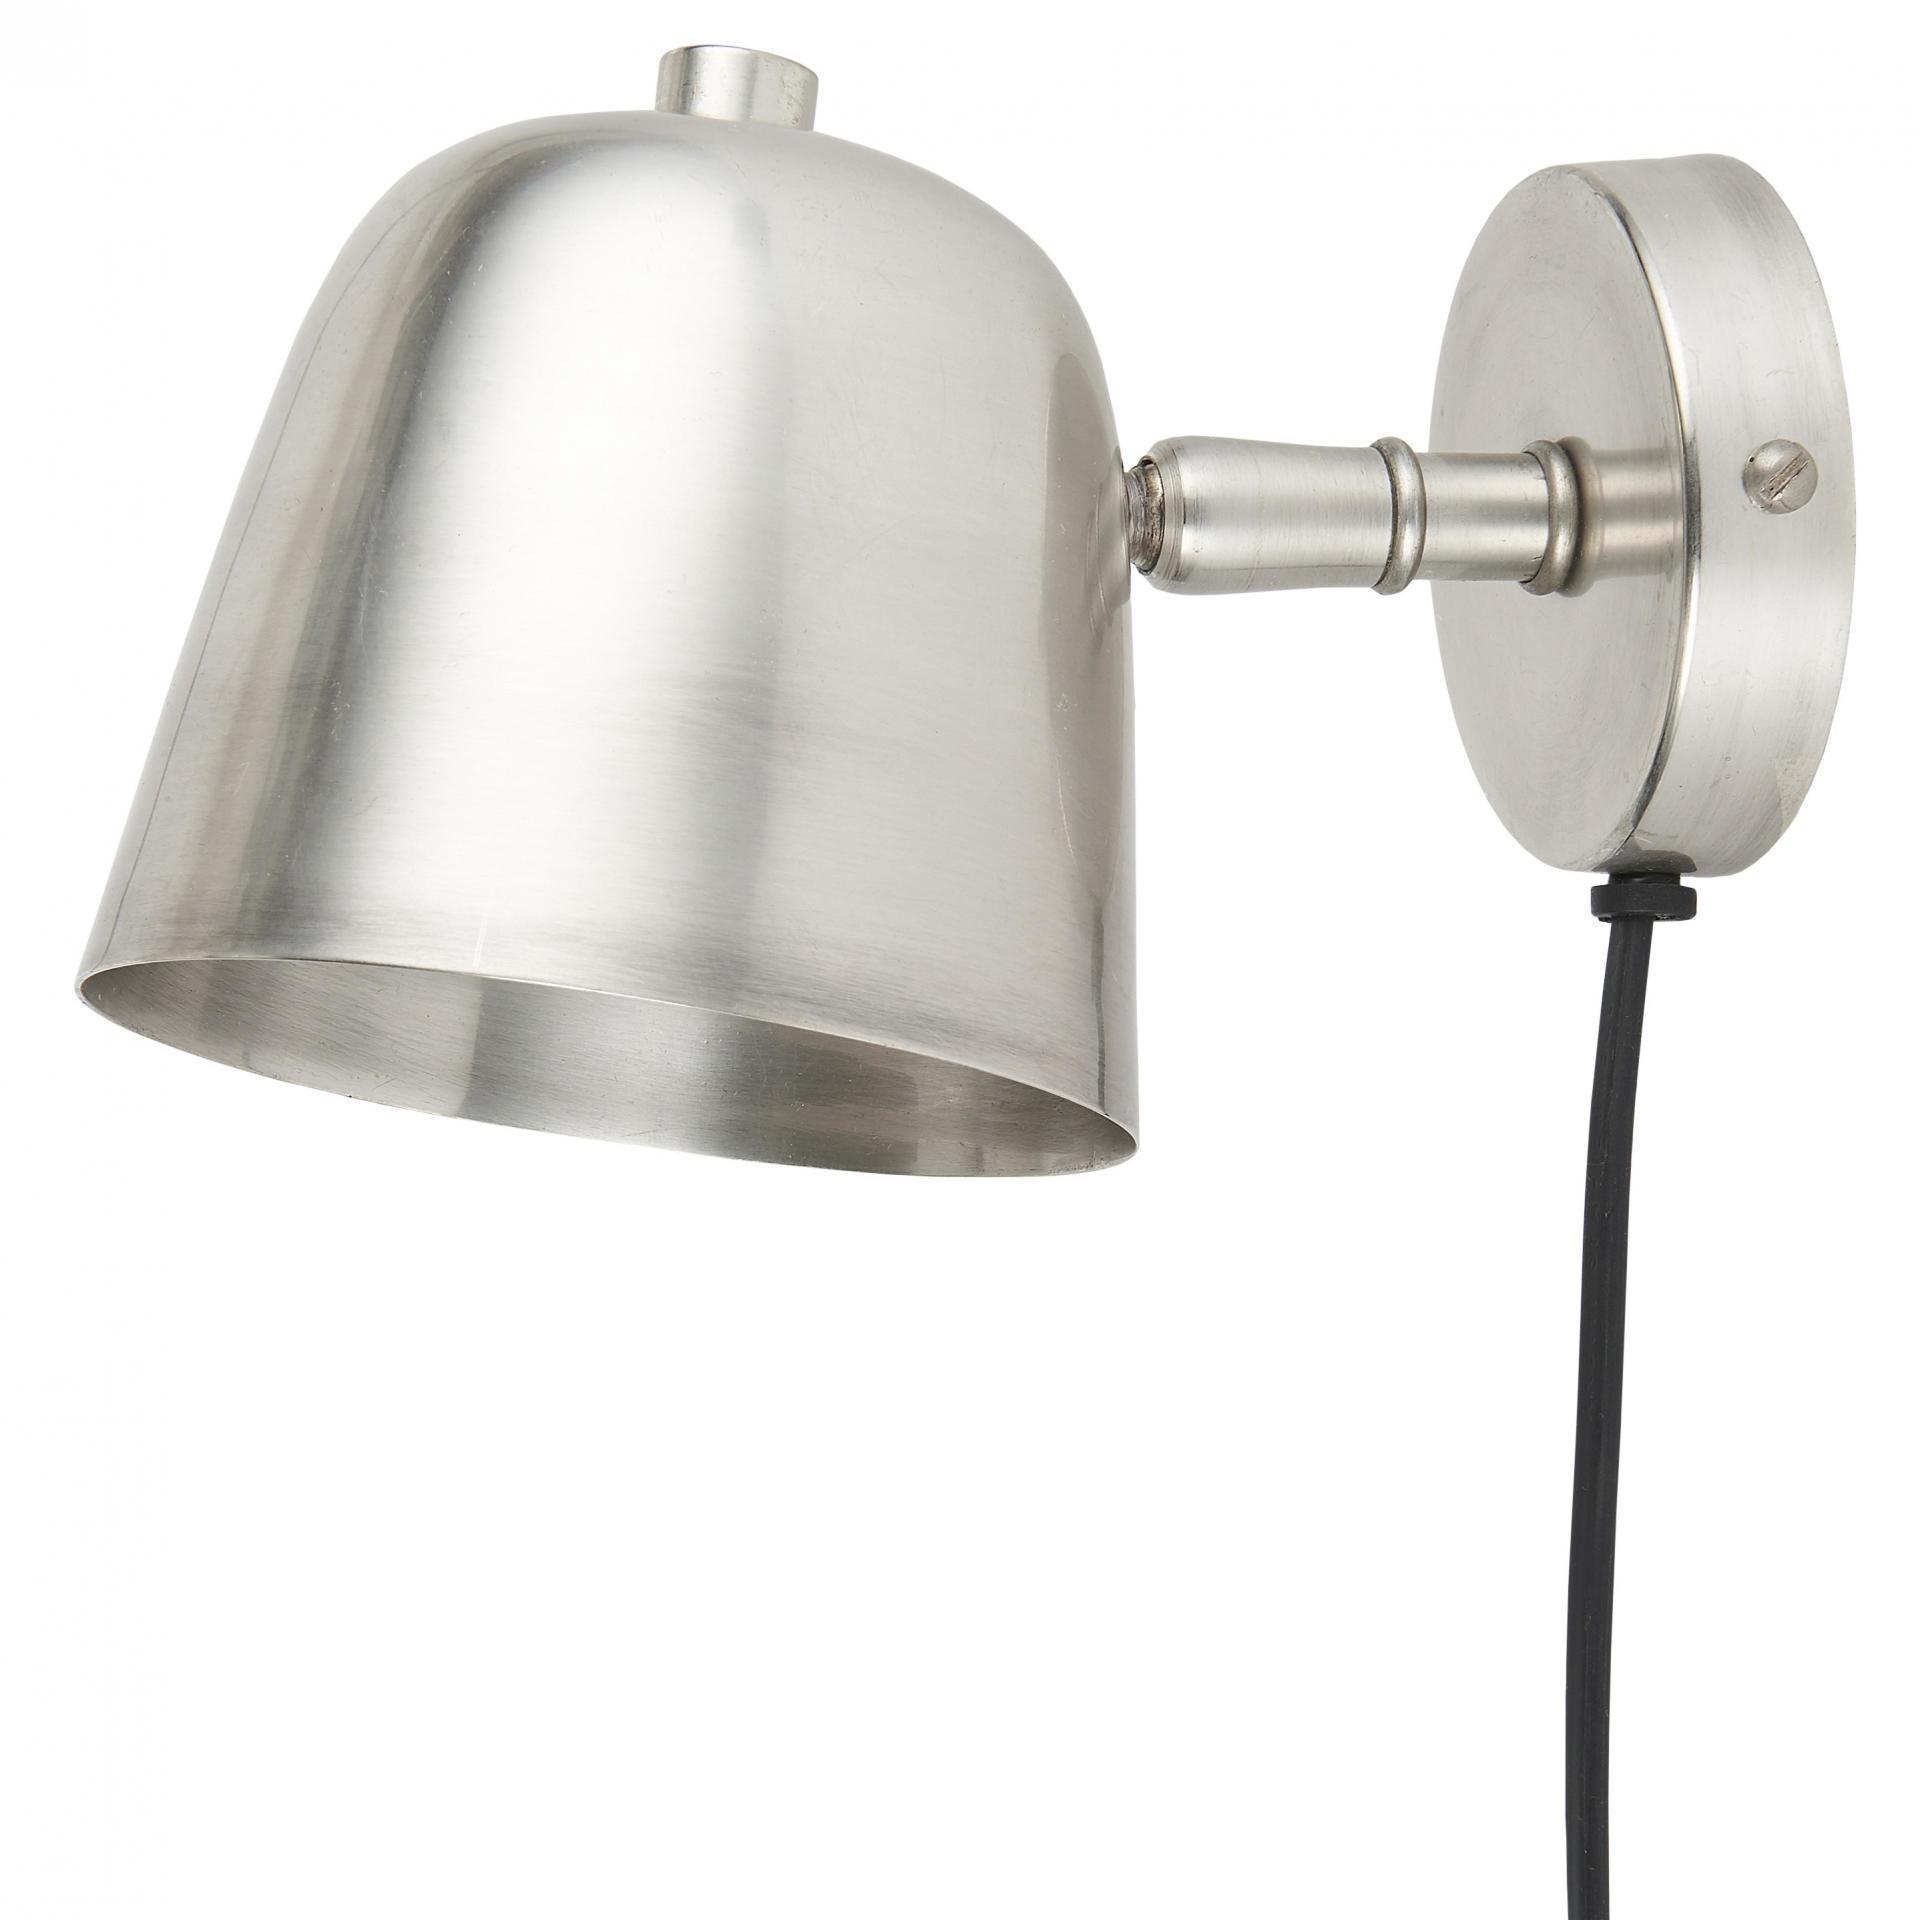 IB LAURSEN Nástěnná lampa Antique silver Round, stříbrná barva, kov